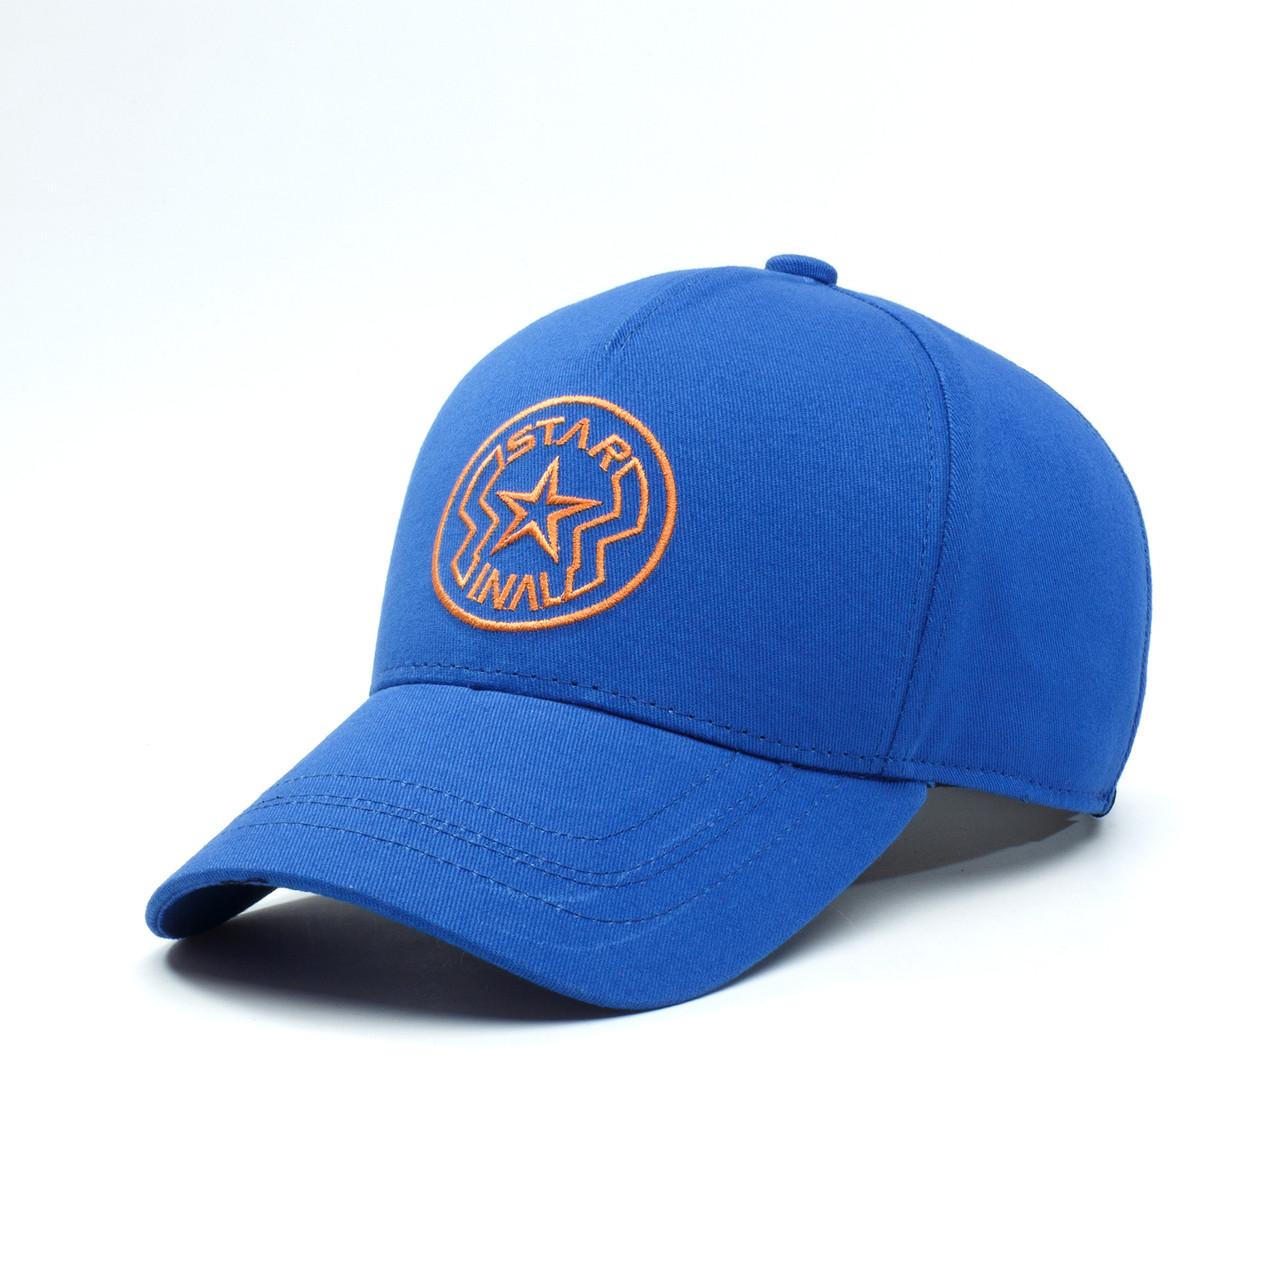 Детская кепка бейсболка INAL star XS / 51-52 RU Синий 238351